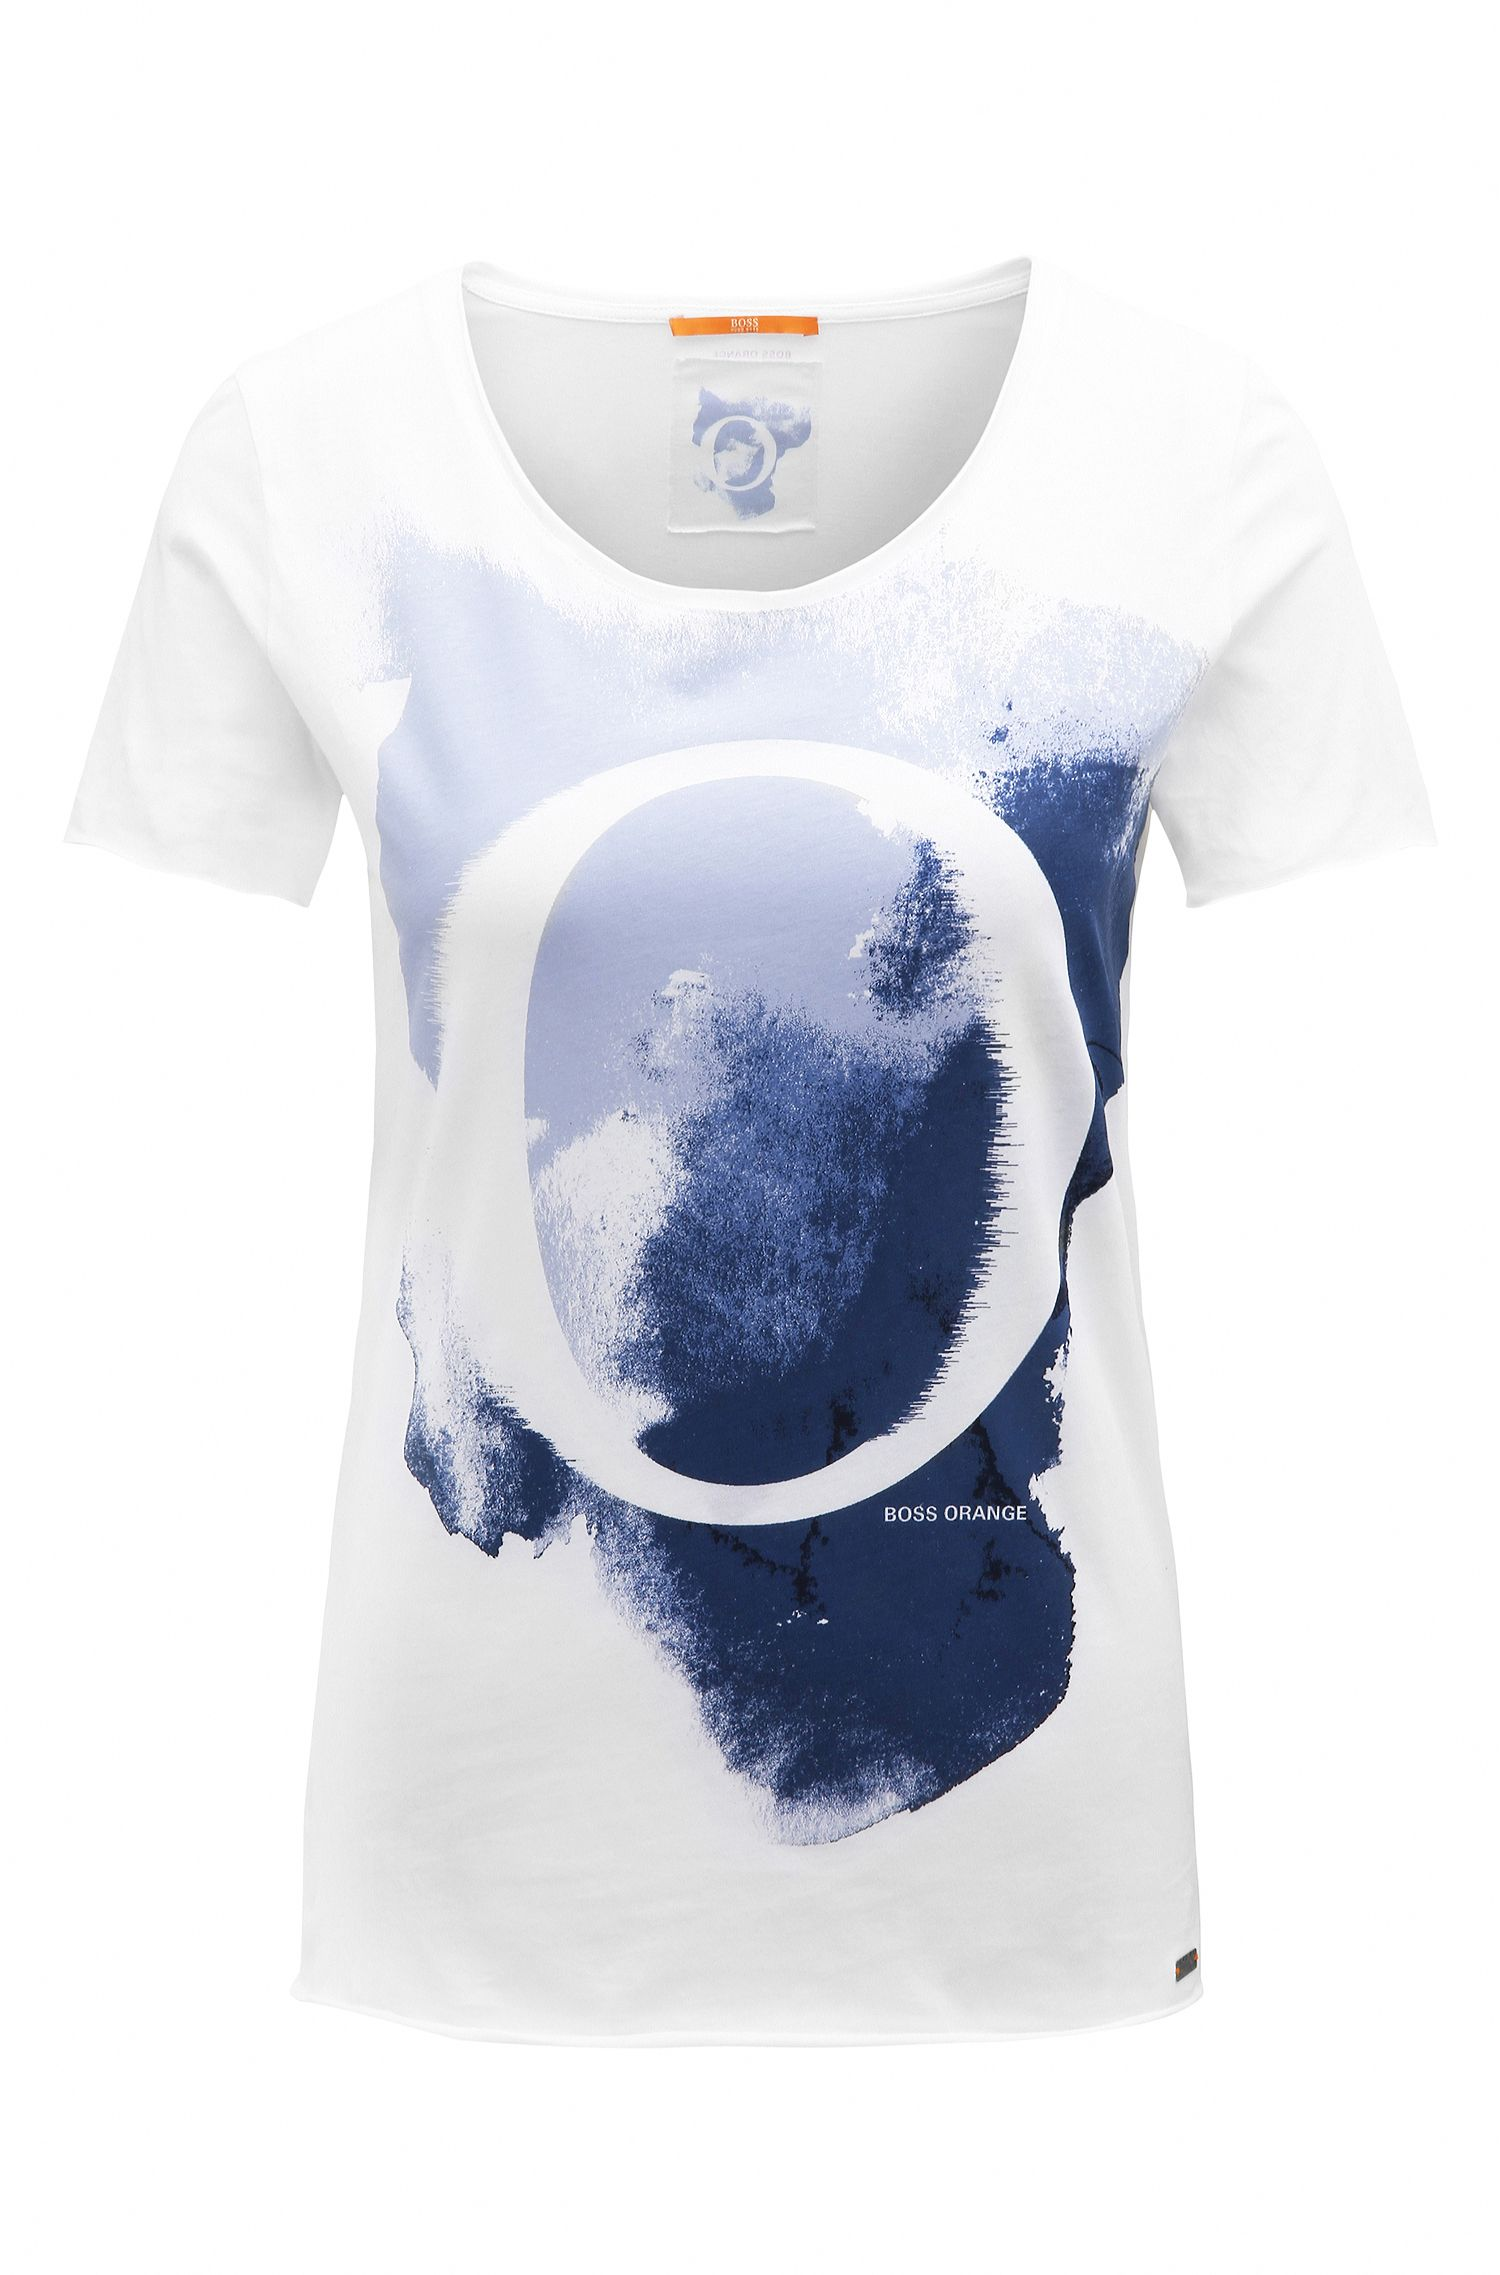 Slim-Fit T-Shirt aus Baumwolle mit Aquarell-Print